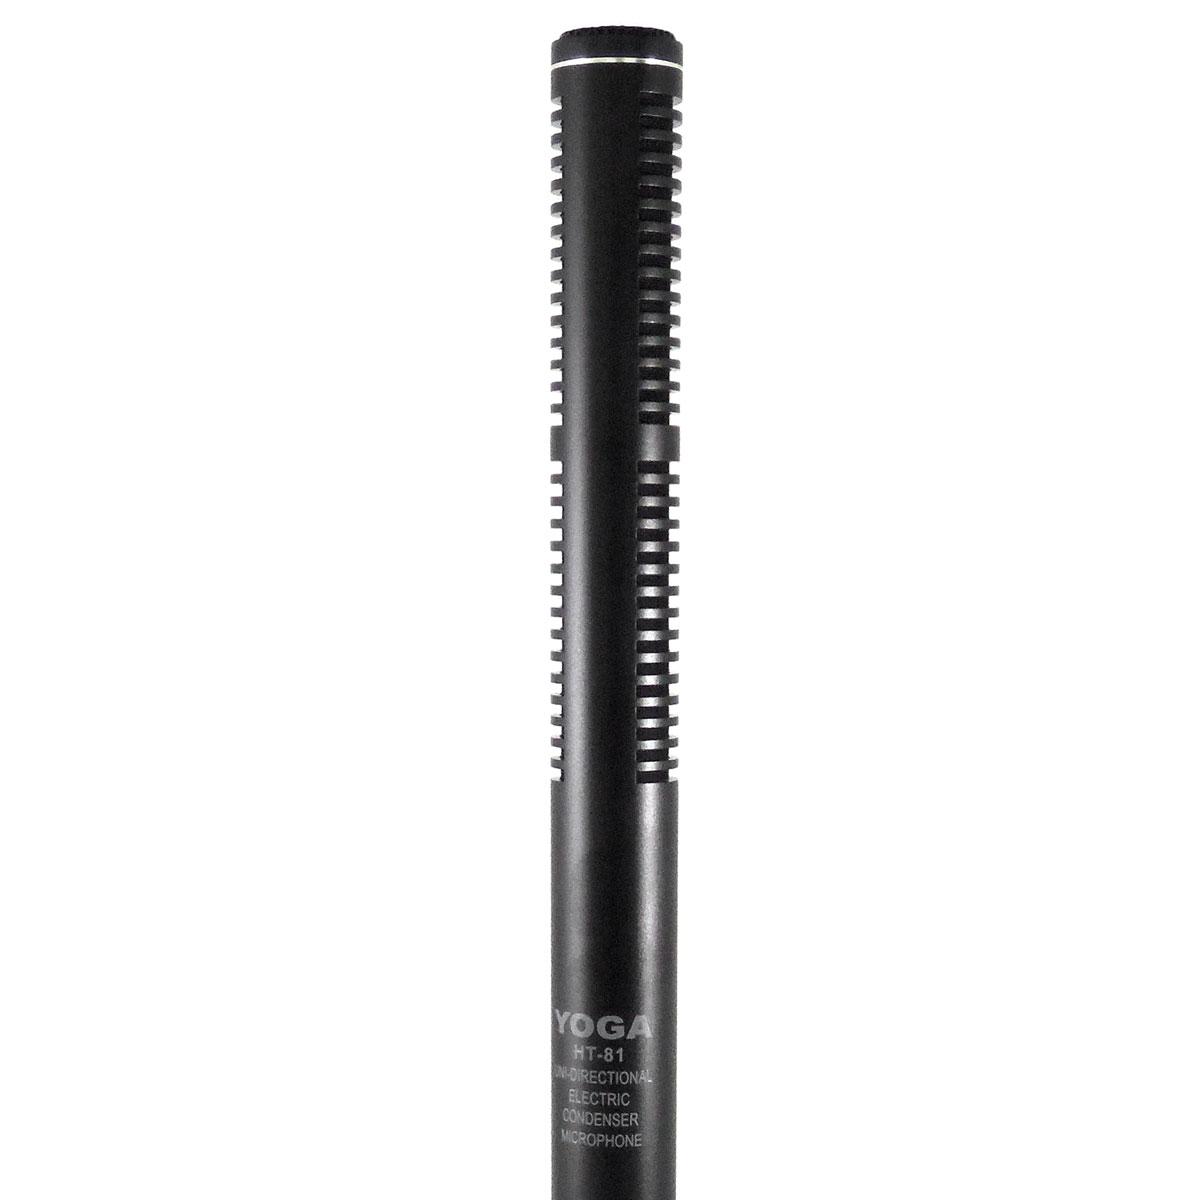 HT81 - Microfone c/ Fio Unidirecional p/ Filmadoras HT 81 - Yoga